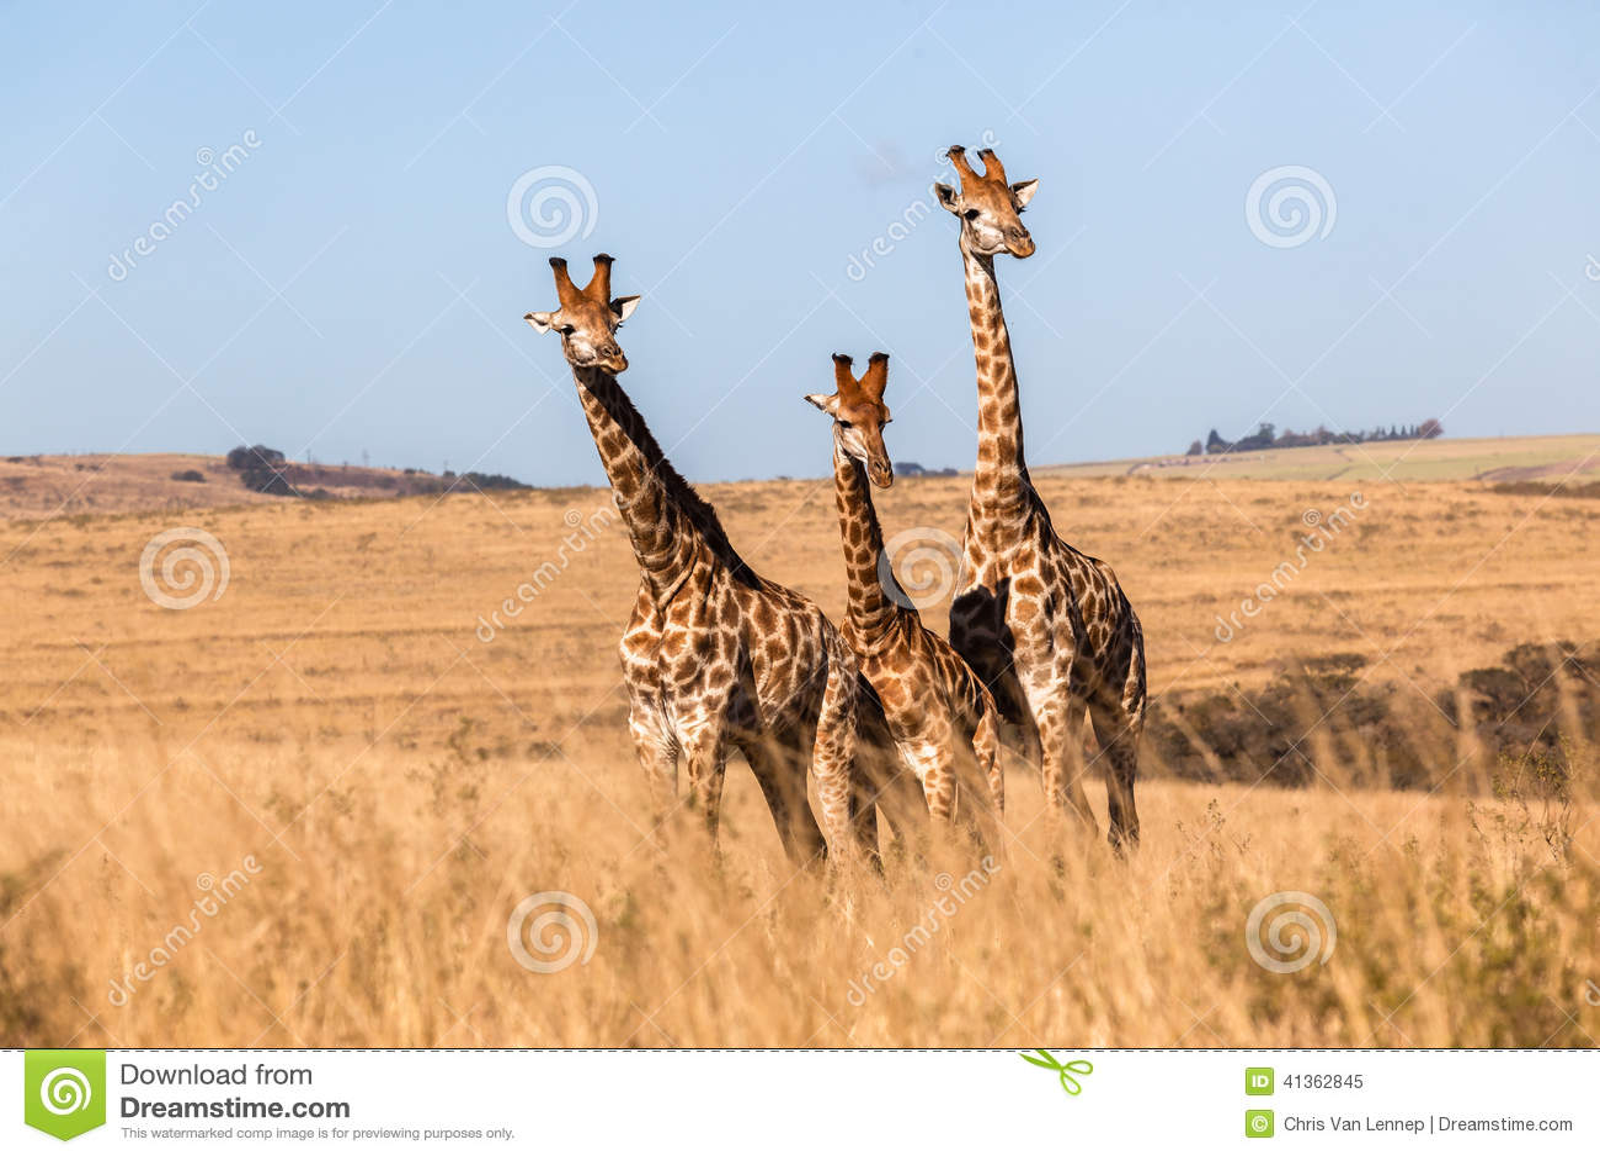 Three Giraffes Together Wildlife Animals Stock Photo - Image: 41362845